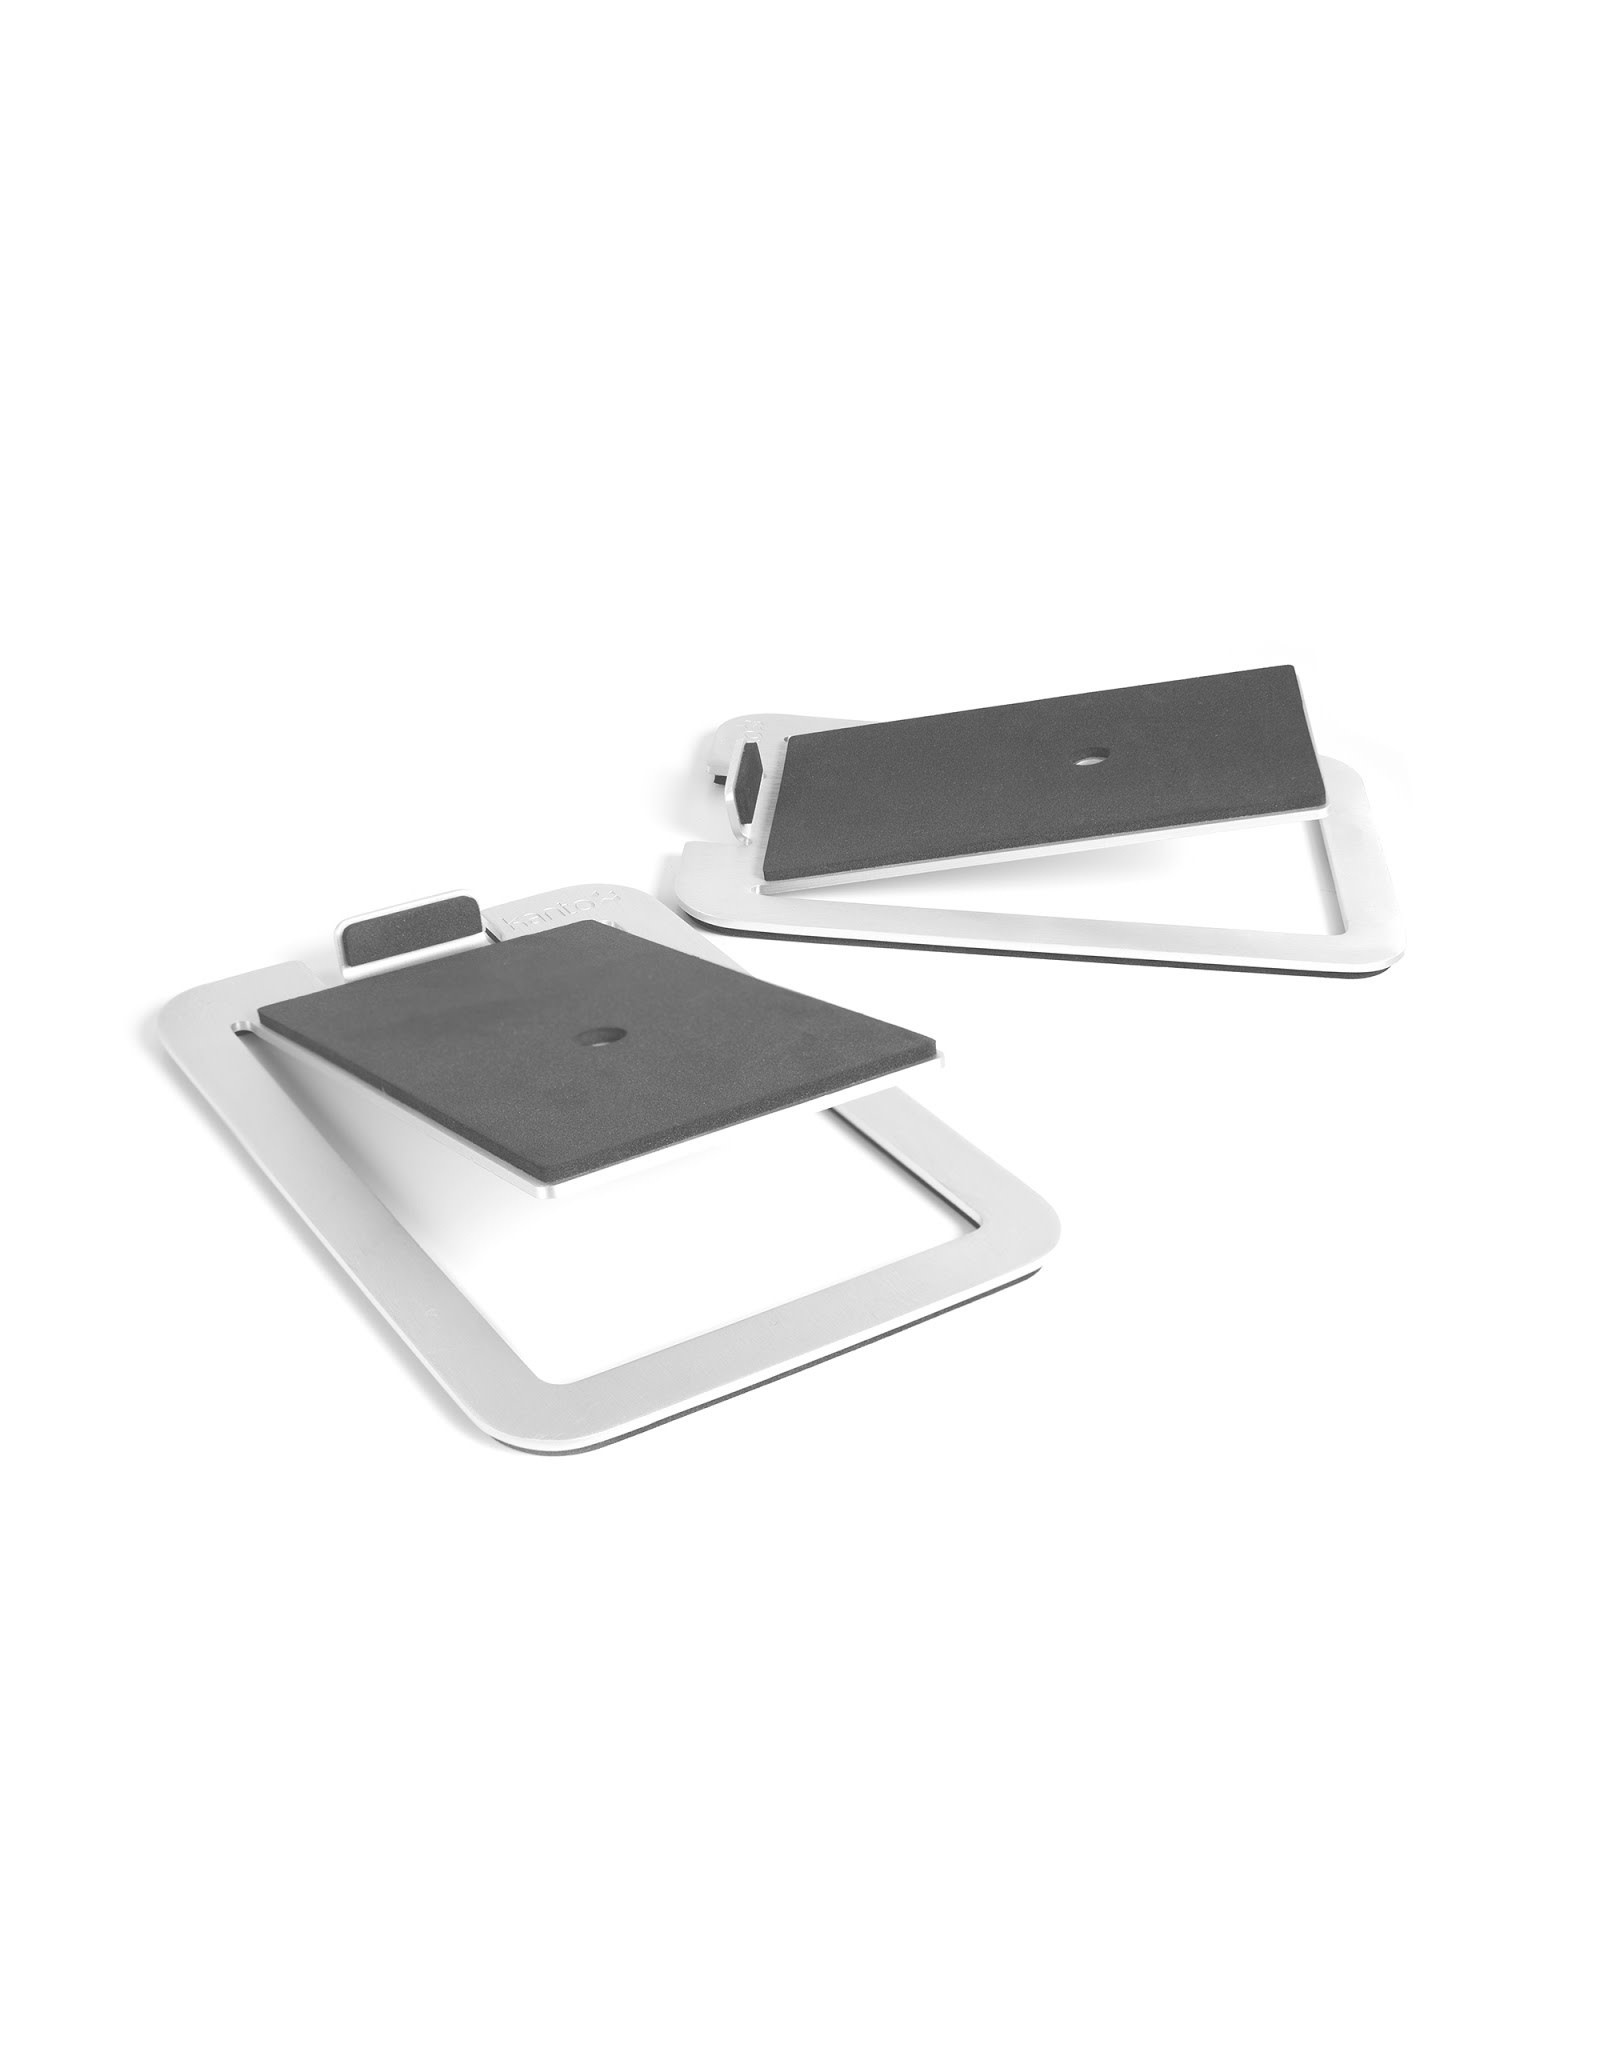 Kanto Kanto S4 Desktop Speaker Stands